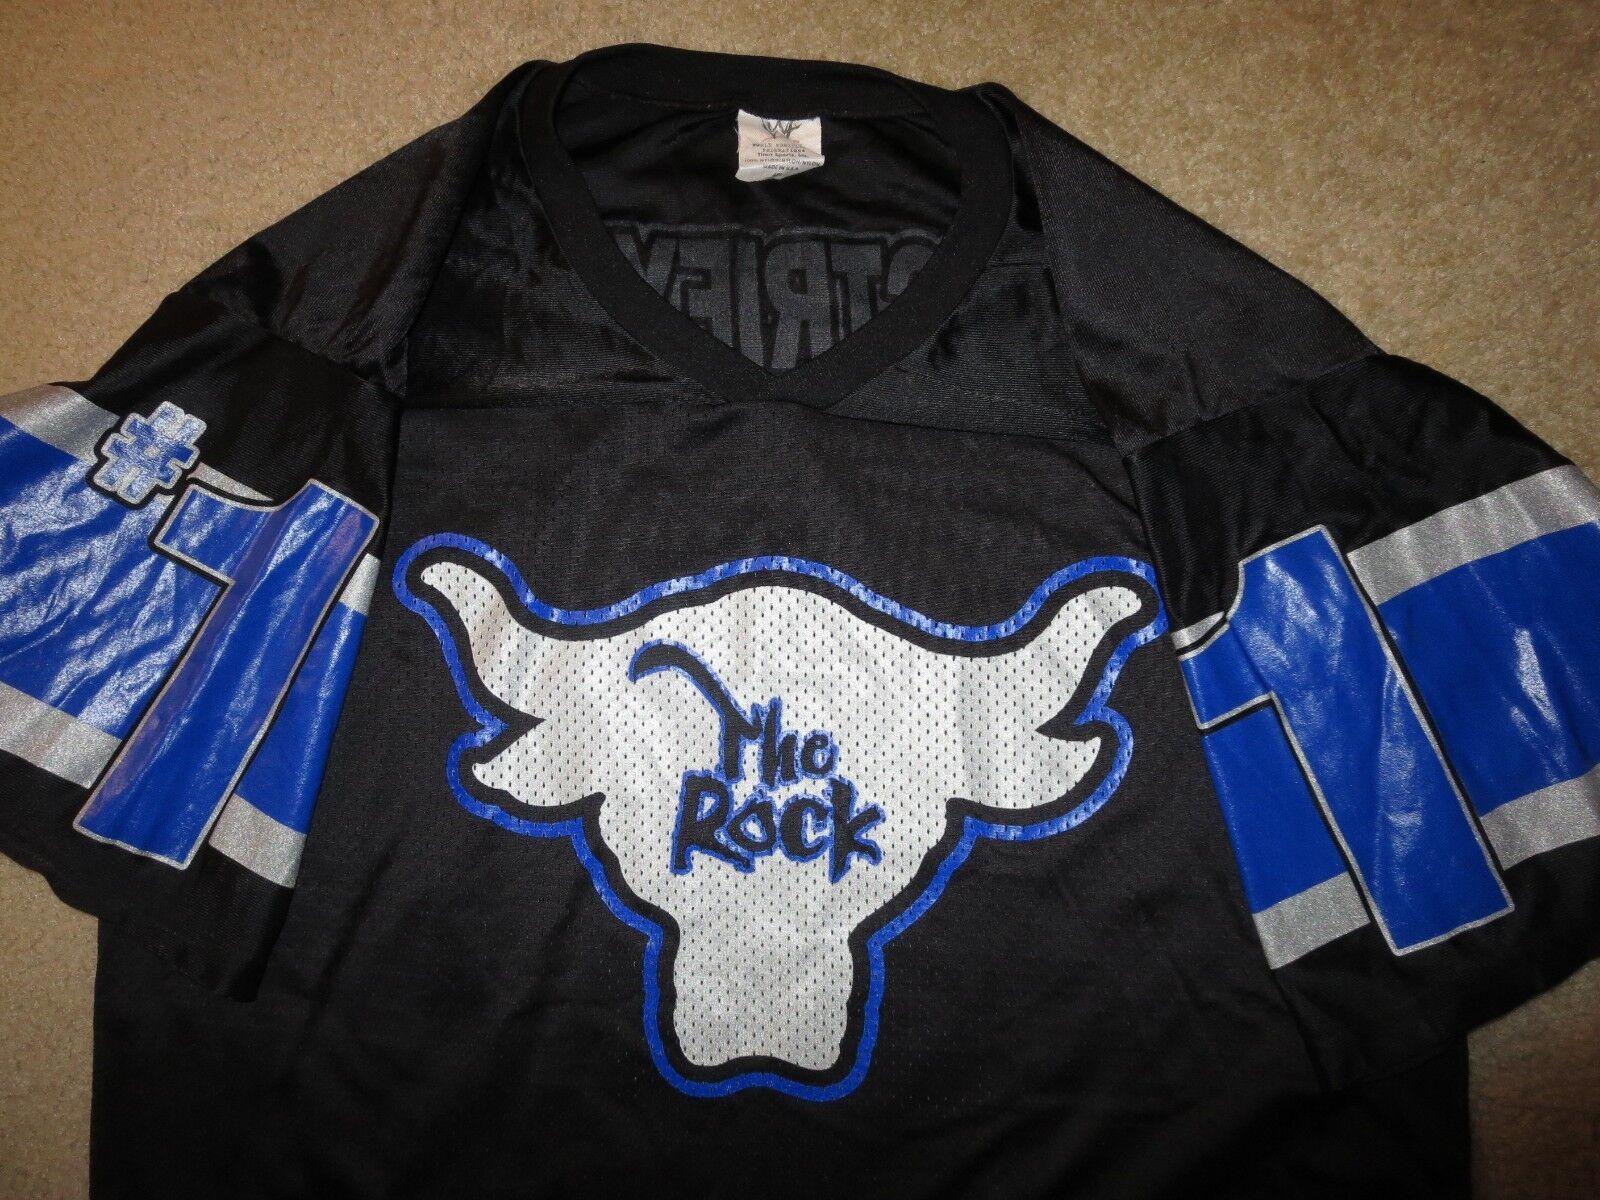 La Roca Dwayne Johnson Lucha Mundial Mundial Mundial Federación Wwf Wwe Camiseta de Fútbol de Lg 133290